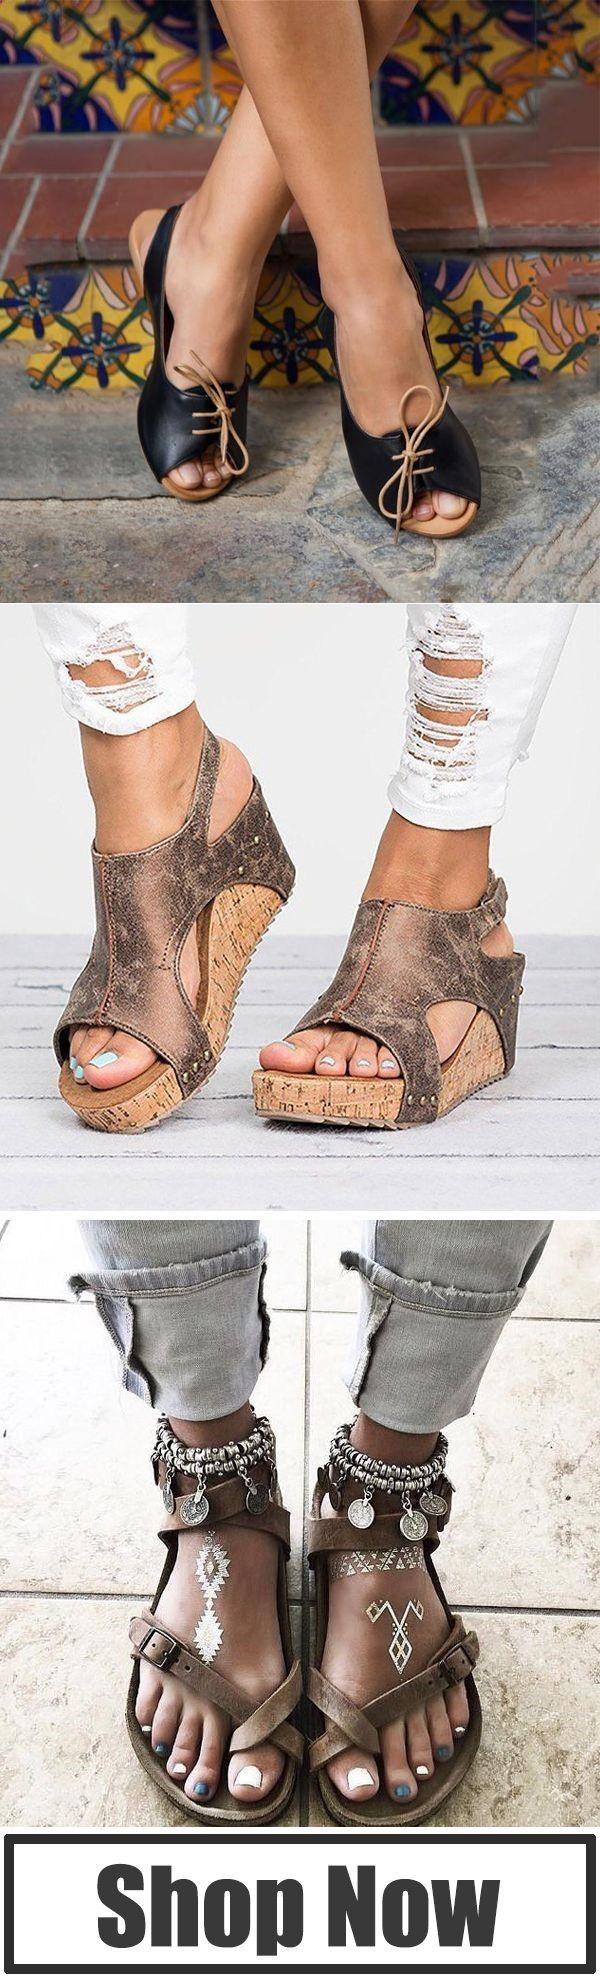 cb9dce36281e Women s Sandals -  womenssandals - Up to 60%OFF ! 2019 Womens Hot Sandals